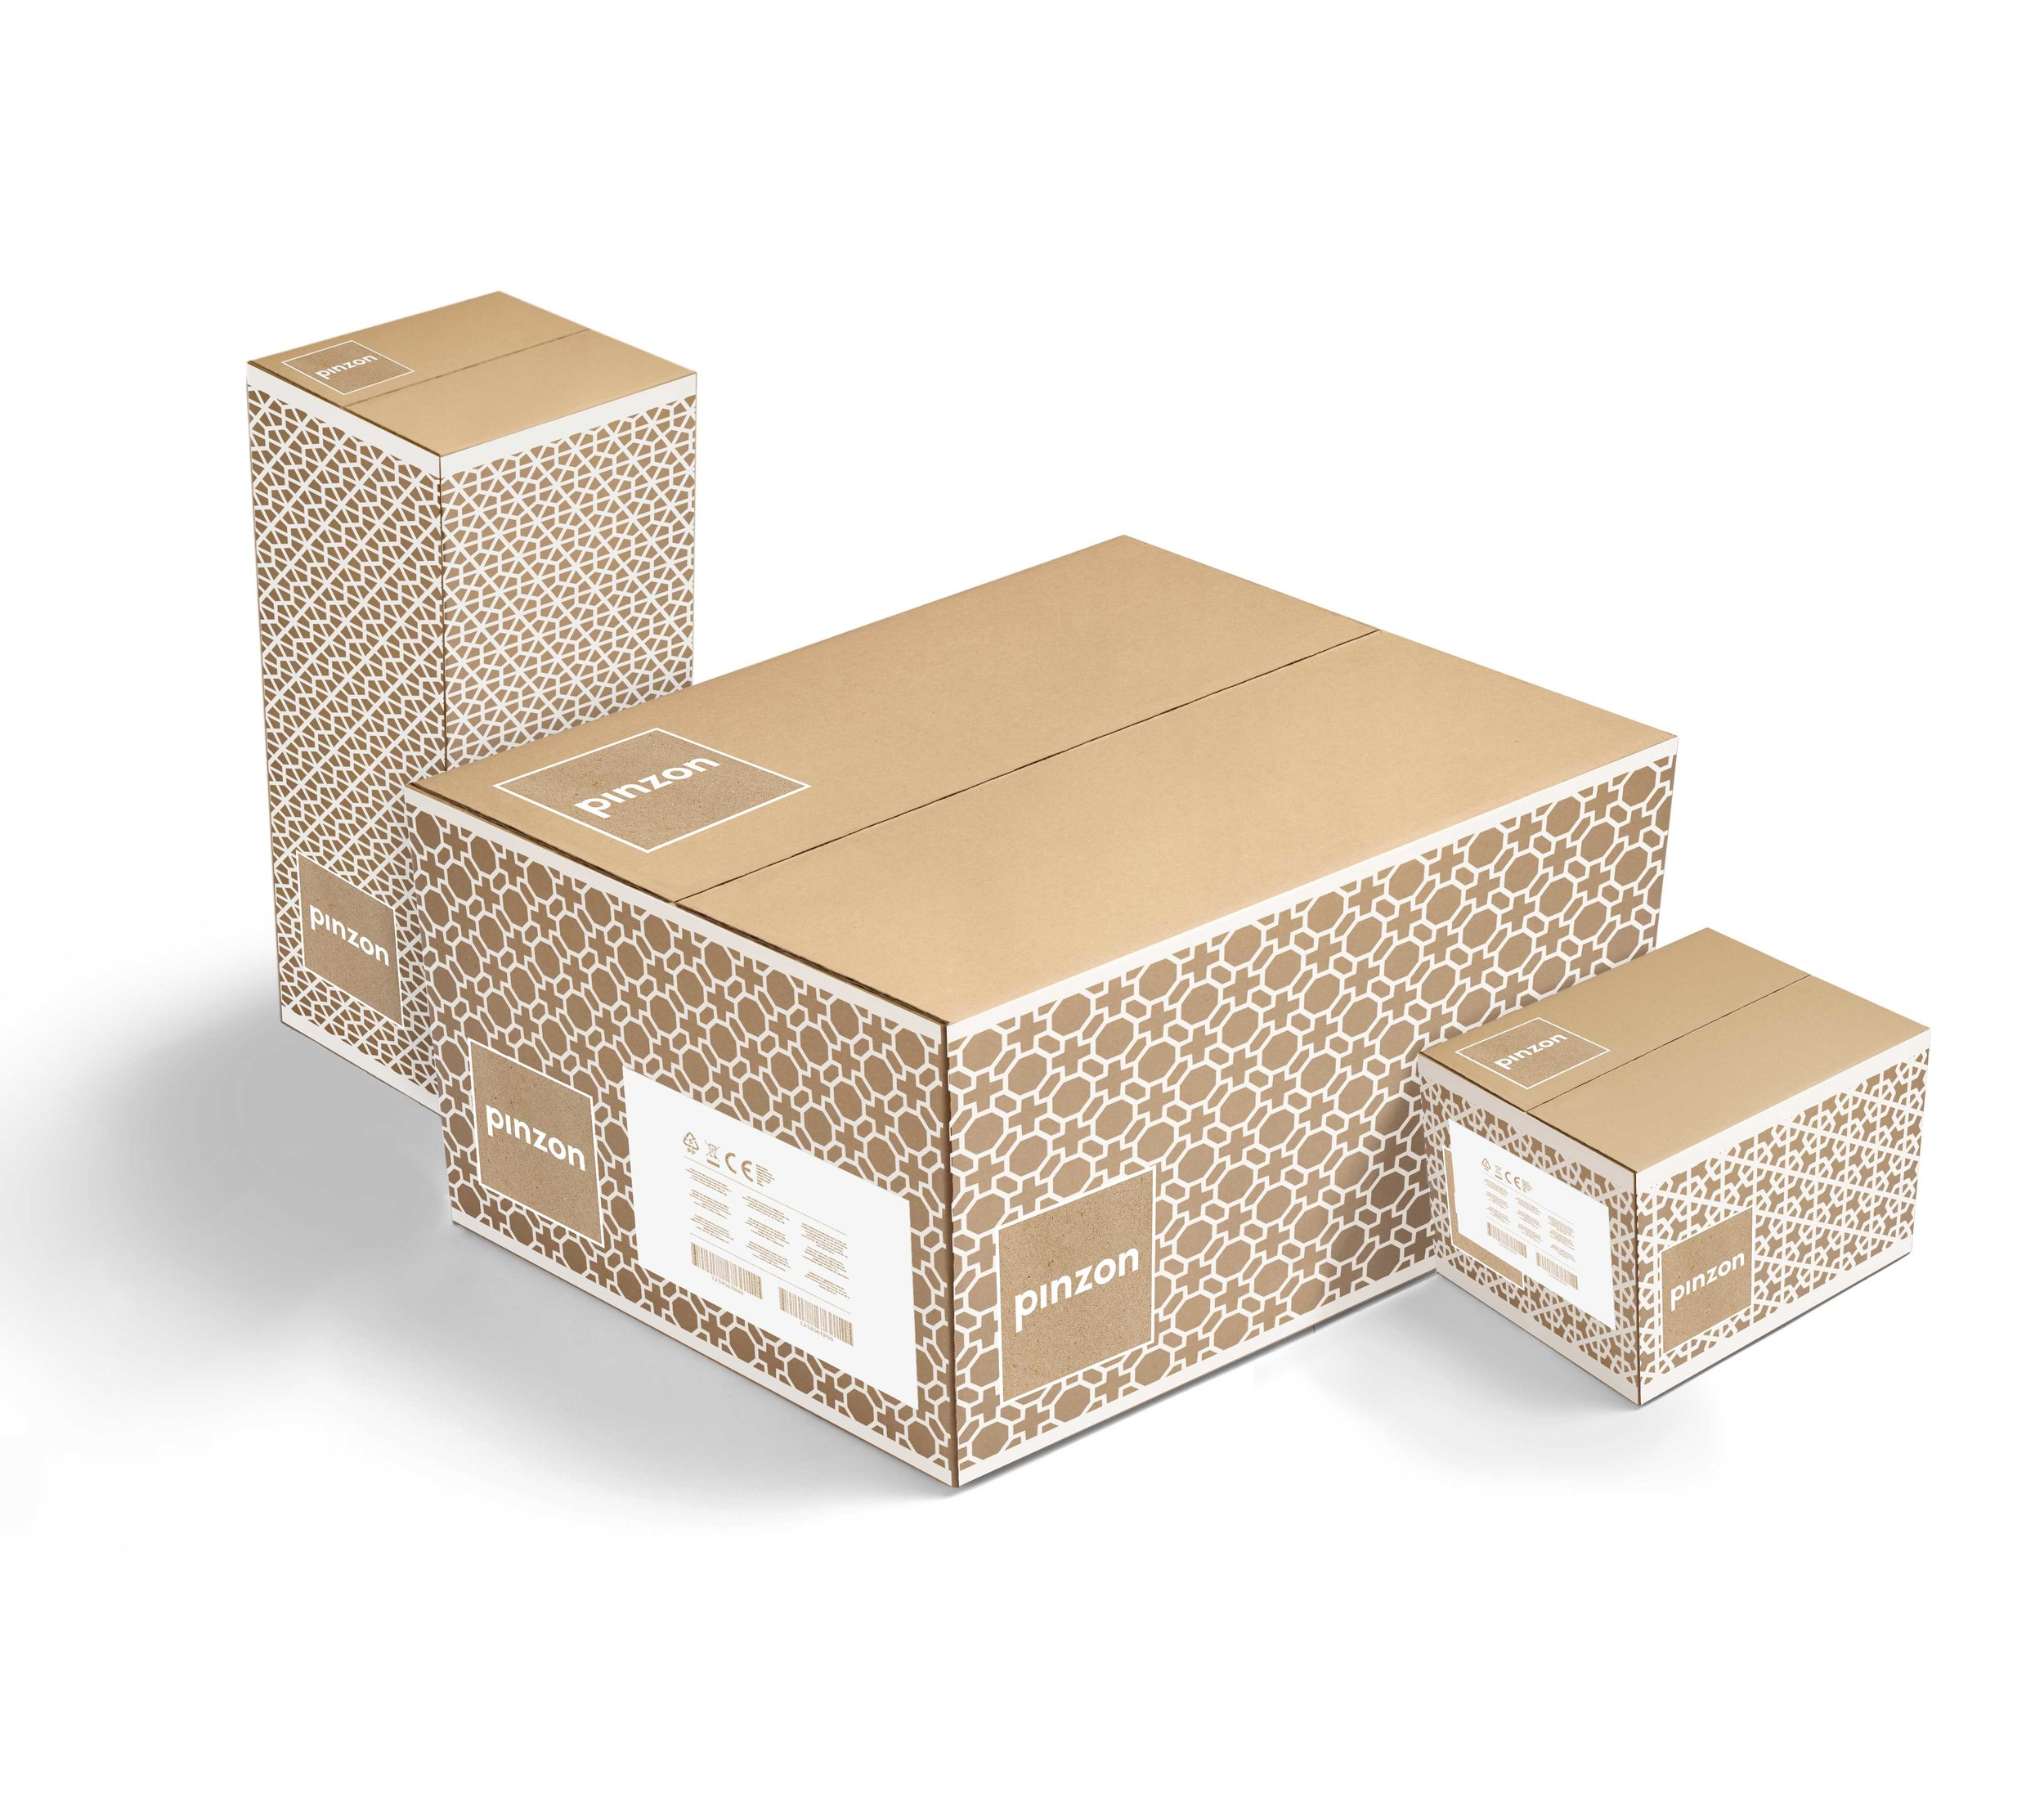 Pinzon packaging design